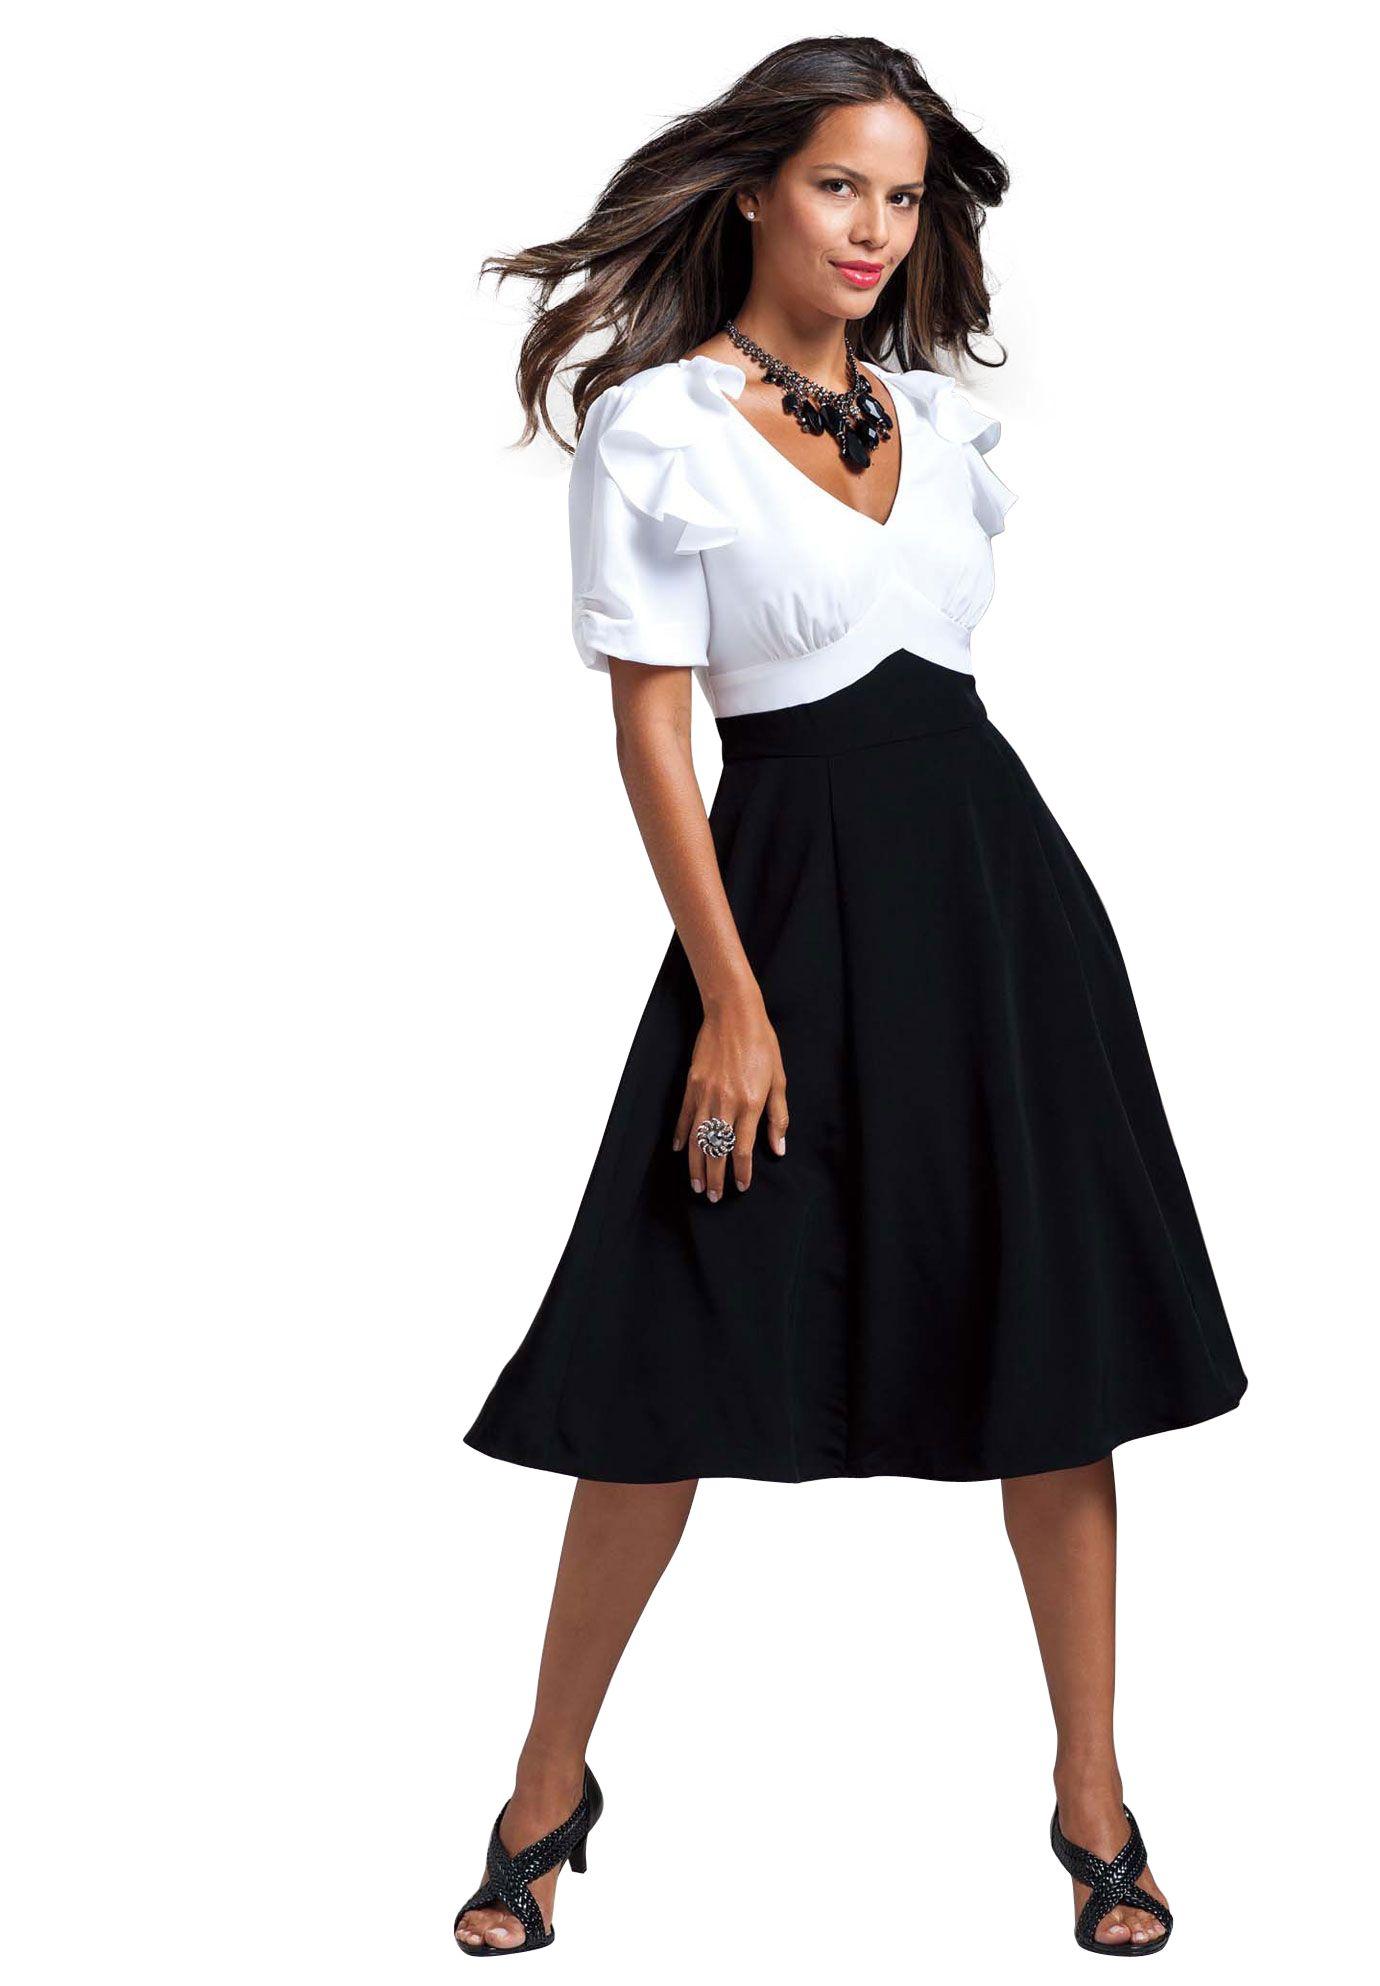 Colorblock Empire Waist Dress Plus Size Special Occasion Dresses